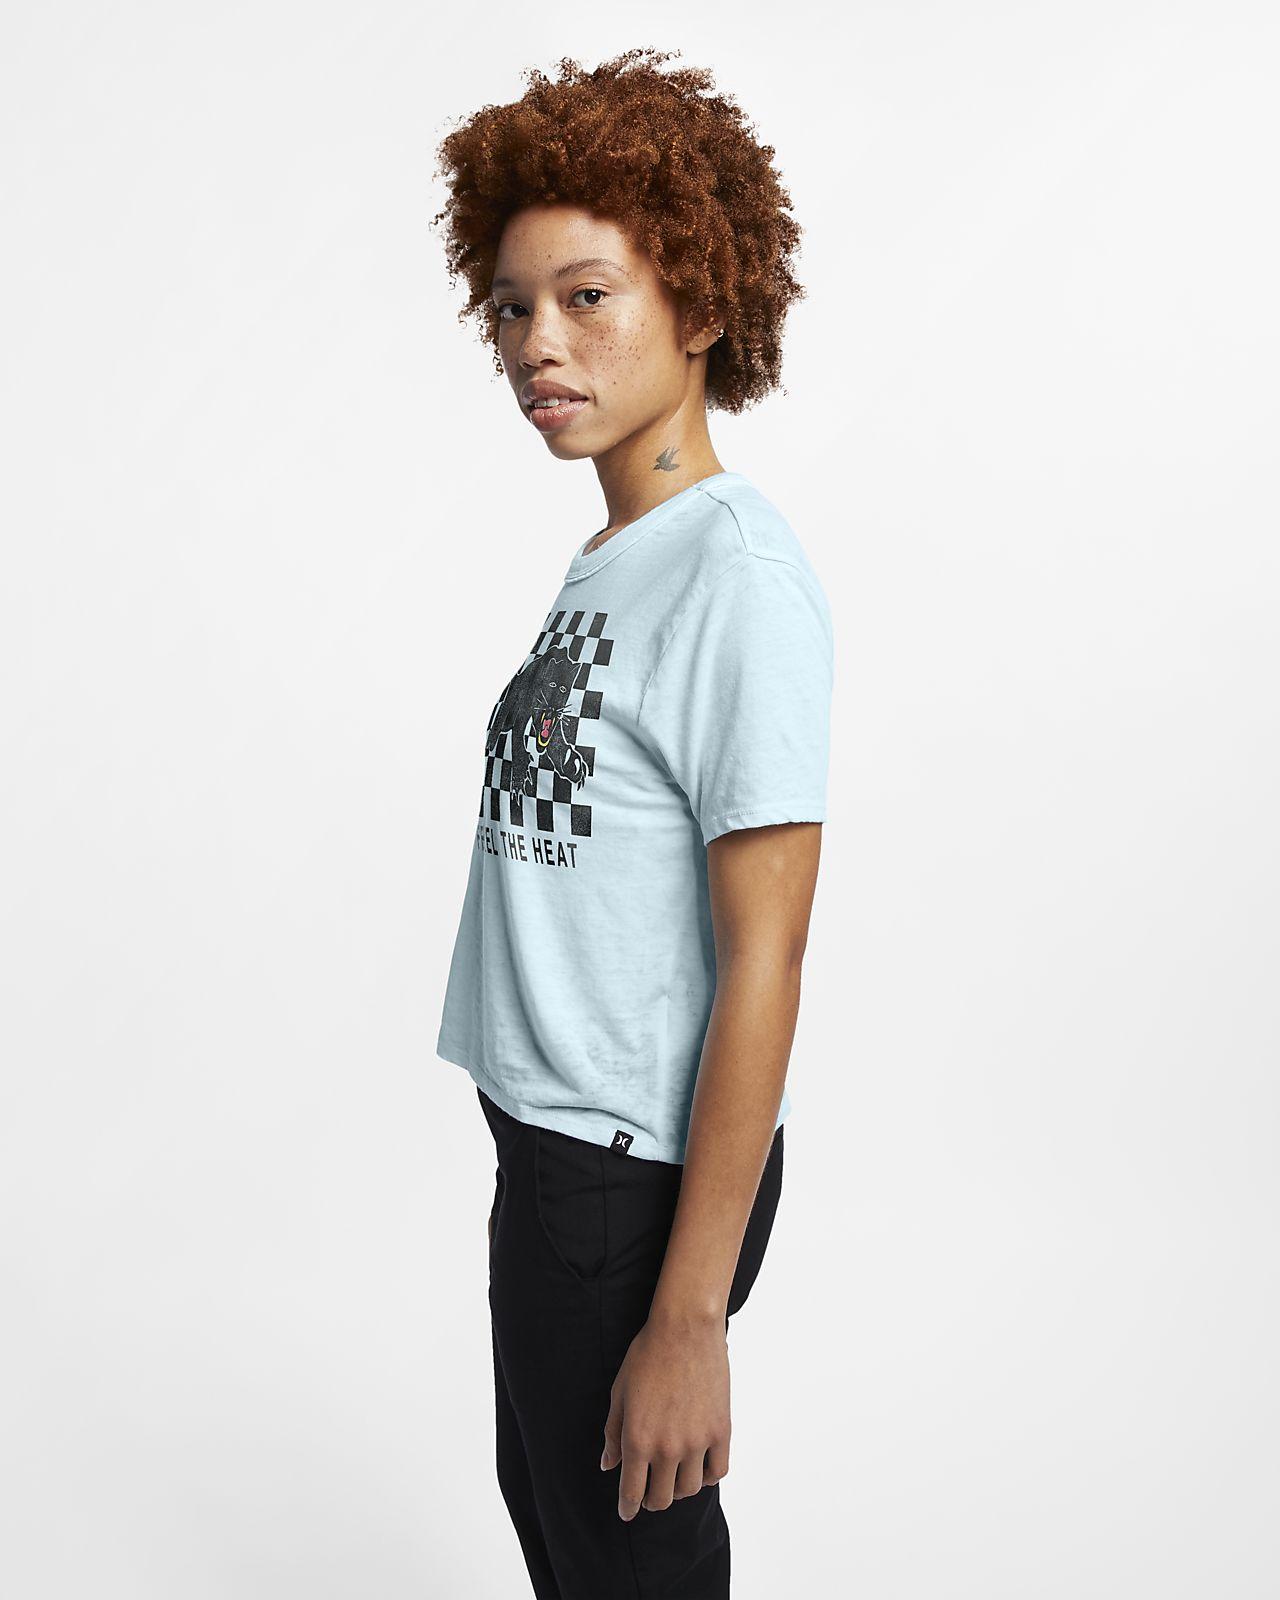 5e2b2d49402c Γυναικεία μπλούζα με κοντό μήκος Hurley Feel The Heat Burnout. Nike ...